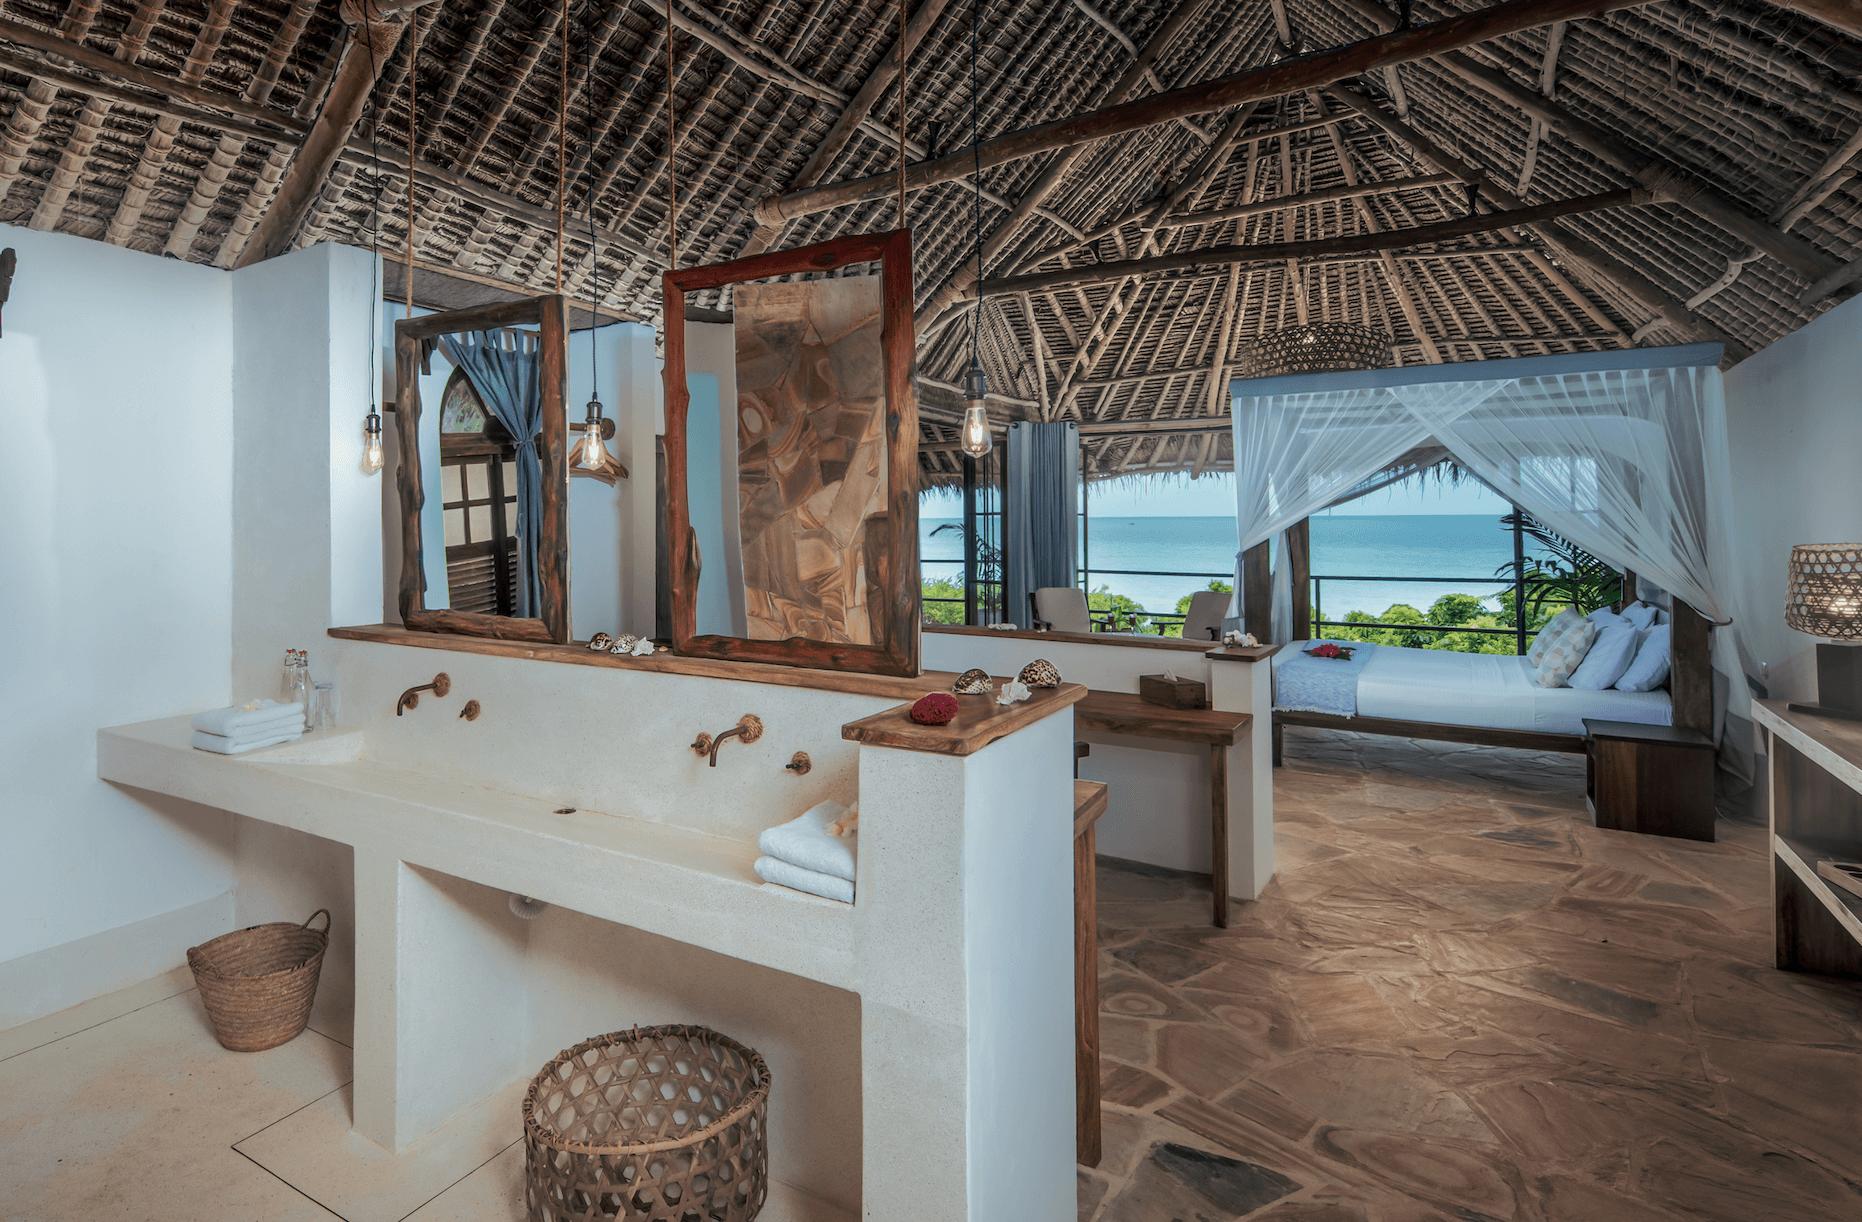 Manta-Resort: Ostafrikanisches Insel-Juwel